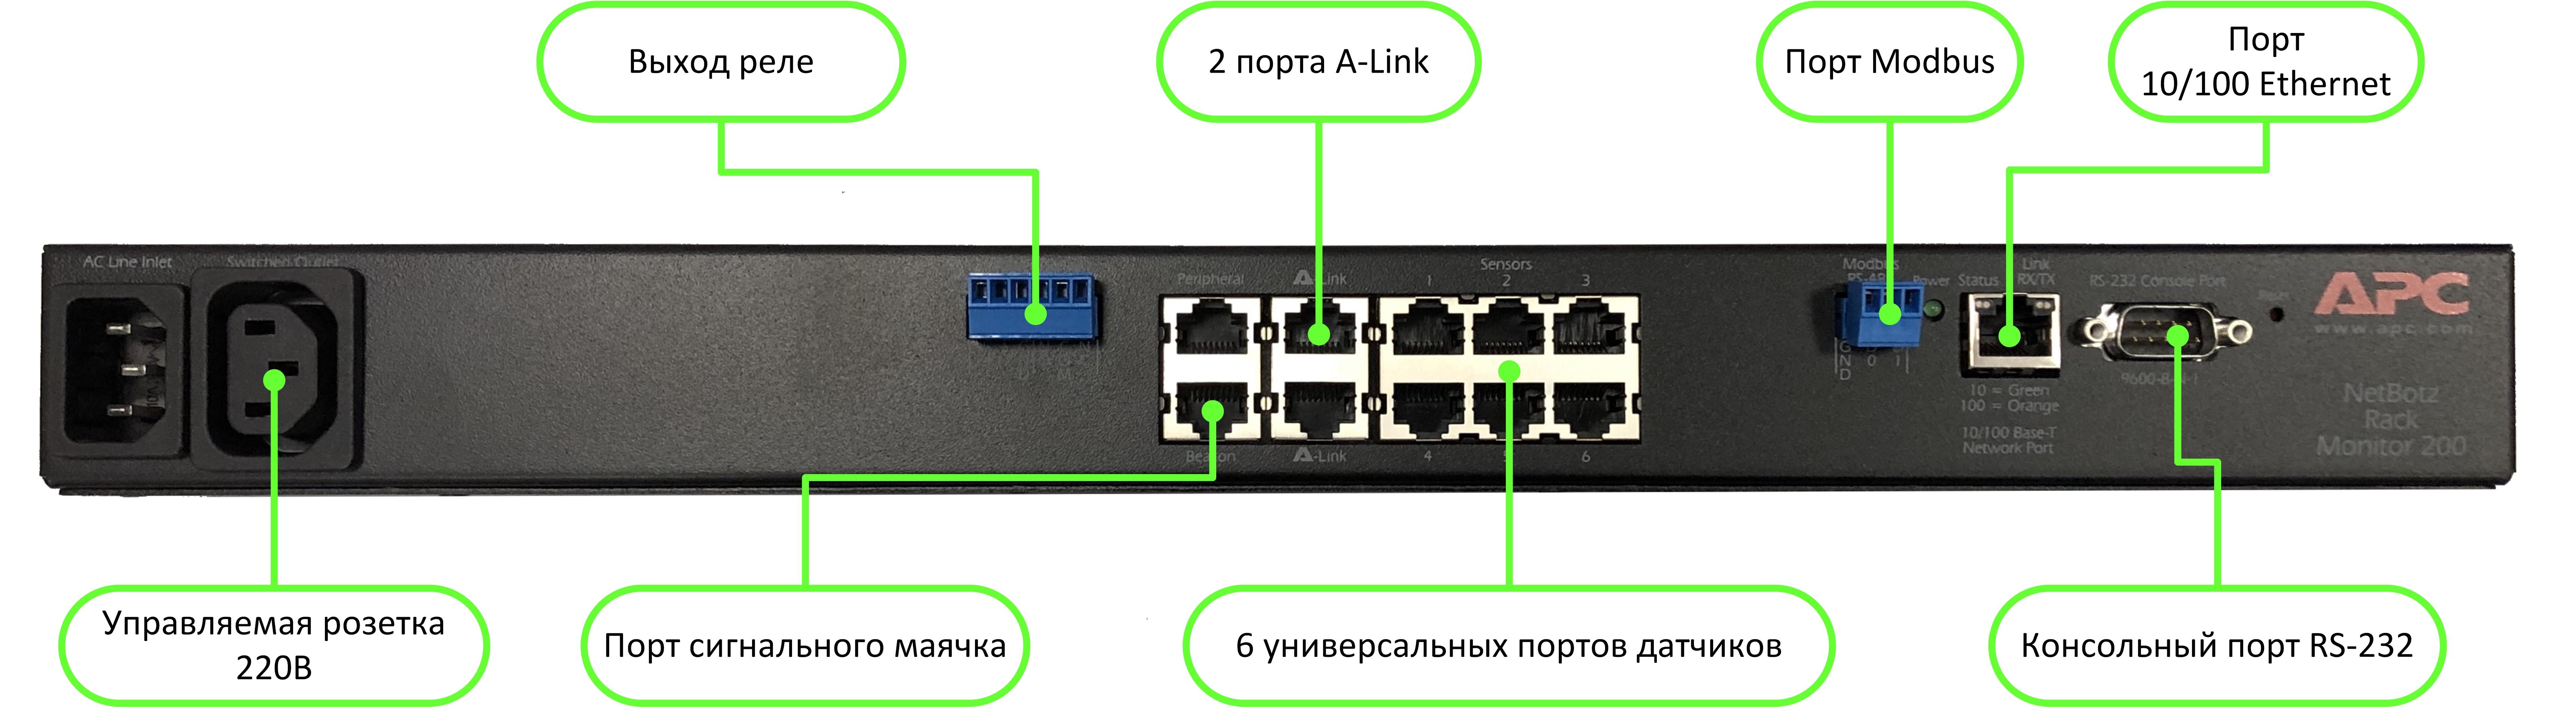 Netbotz элементы панели